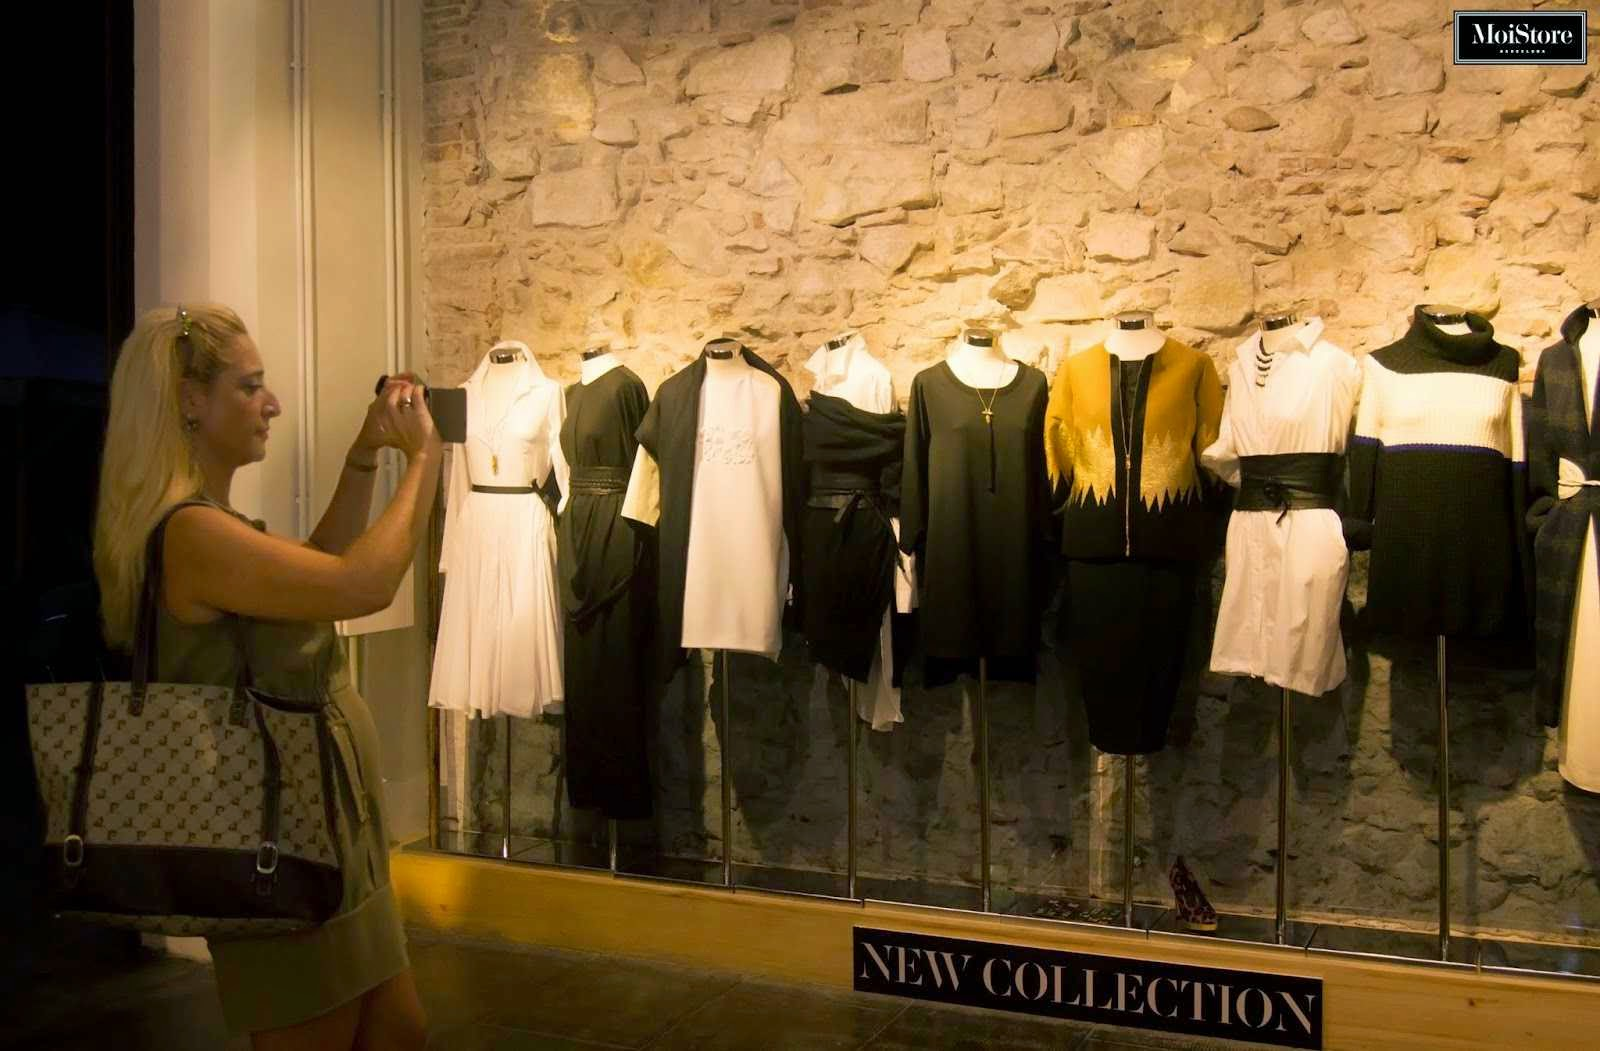 Moistore Barcelona moda en el Borne